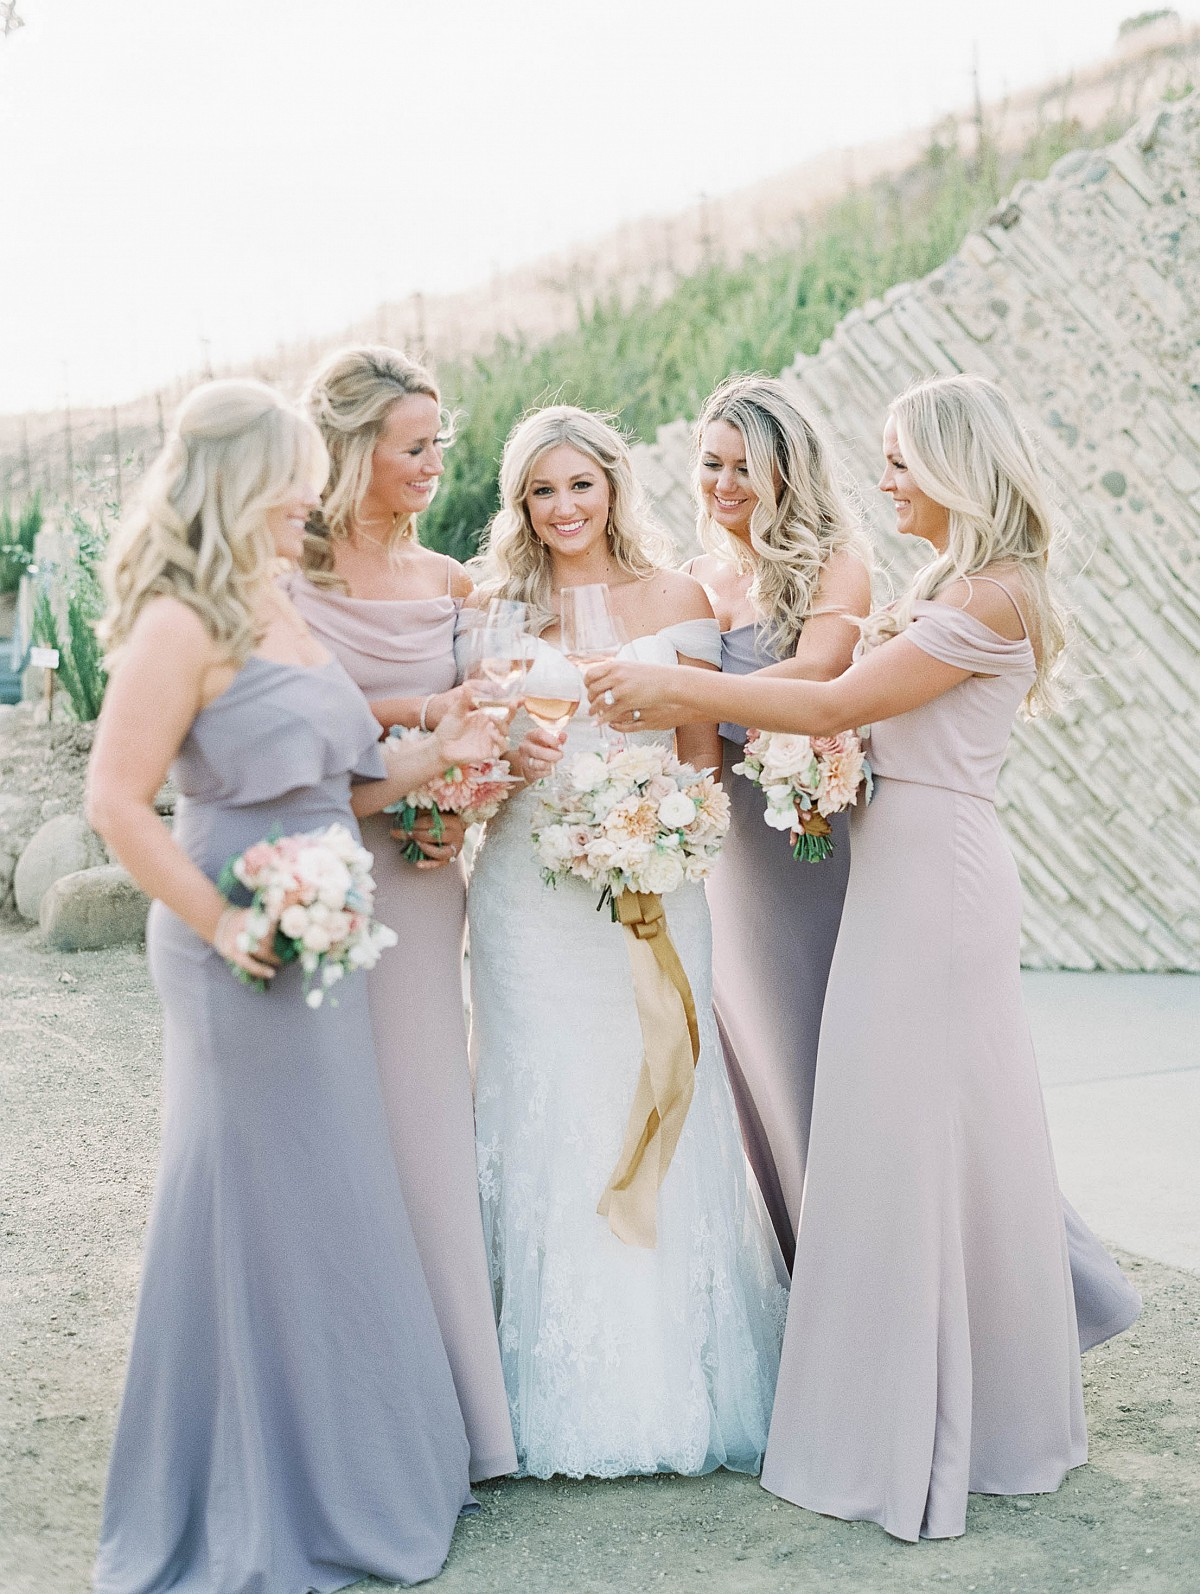 Our favorite bridesmaids looks | Wedding Sparrow fine art wedding blog | Luna de Mare Photography